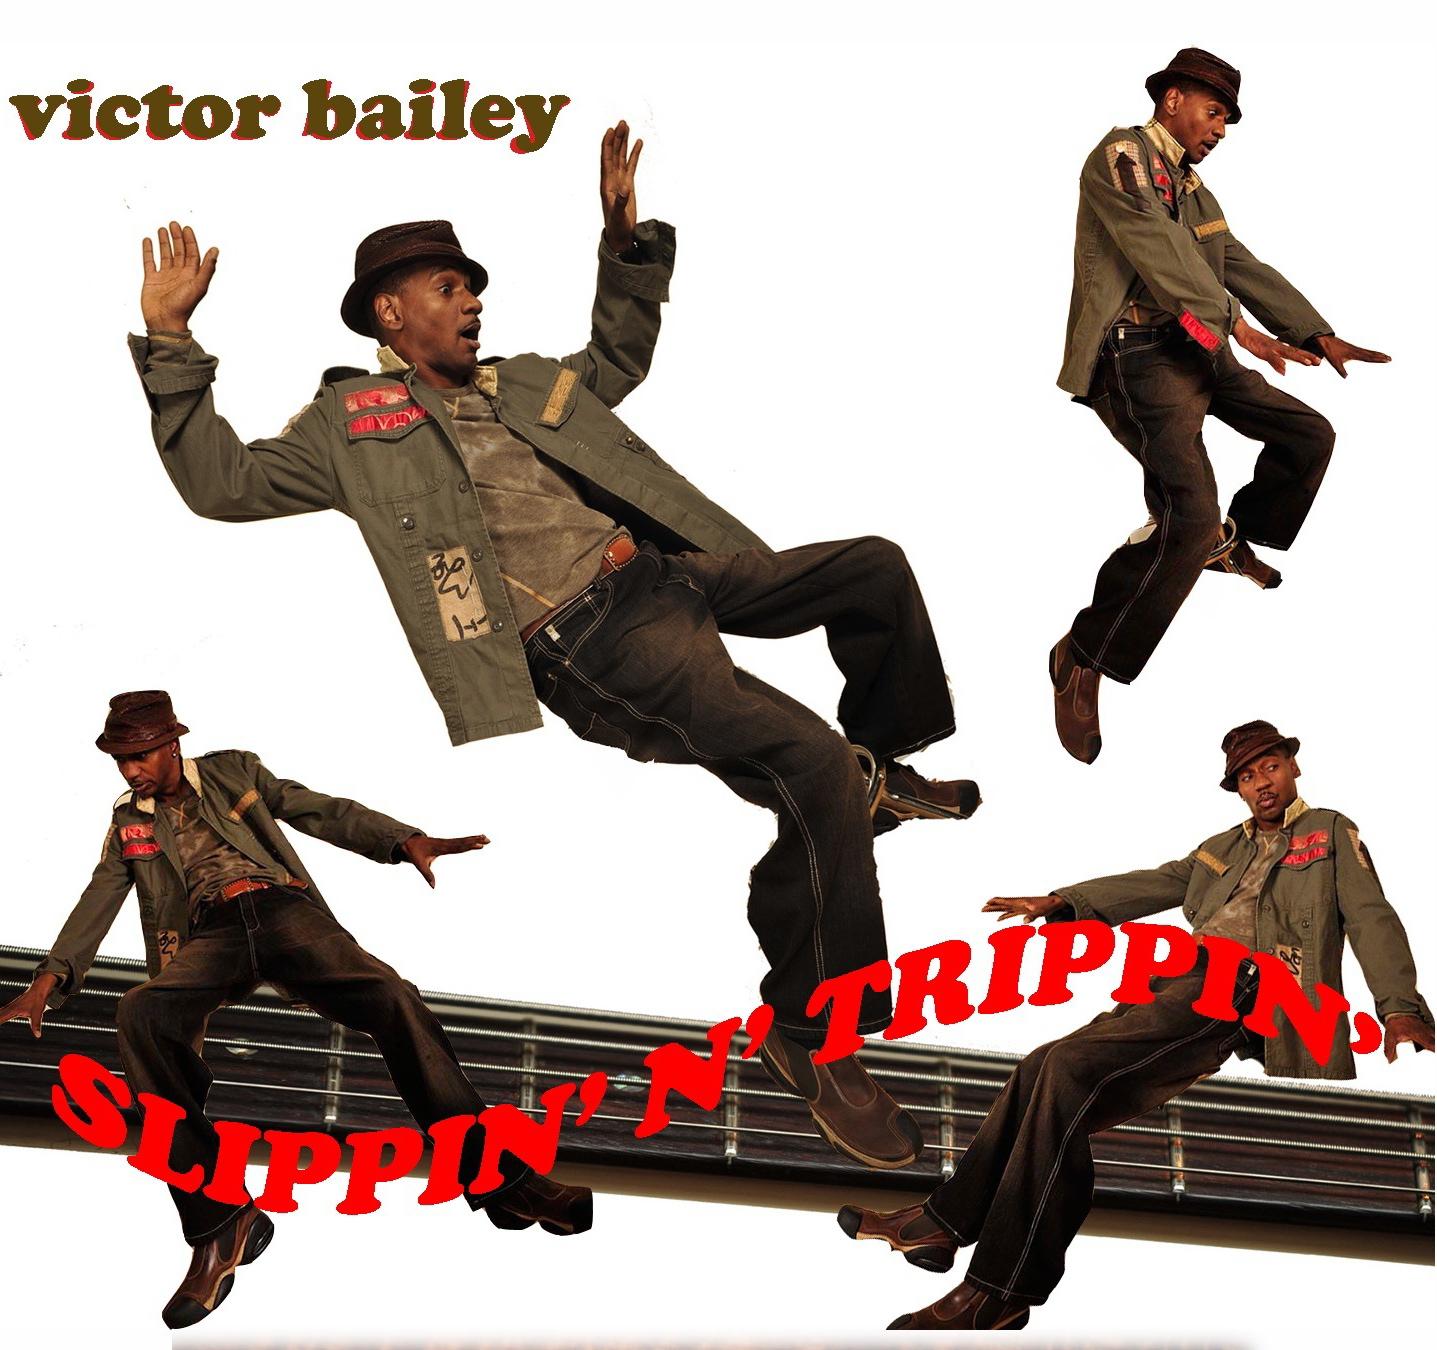 Victor Bailey </br>Slippin&#8217; &#8216;N&#8217; Trippin&#8217;</br>Studio V, 2009